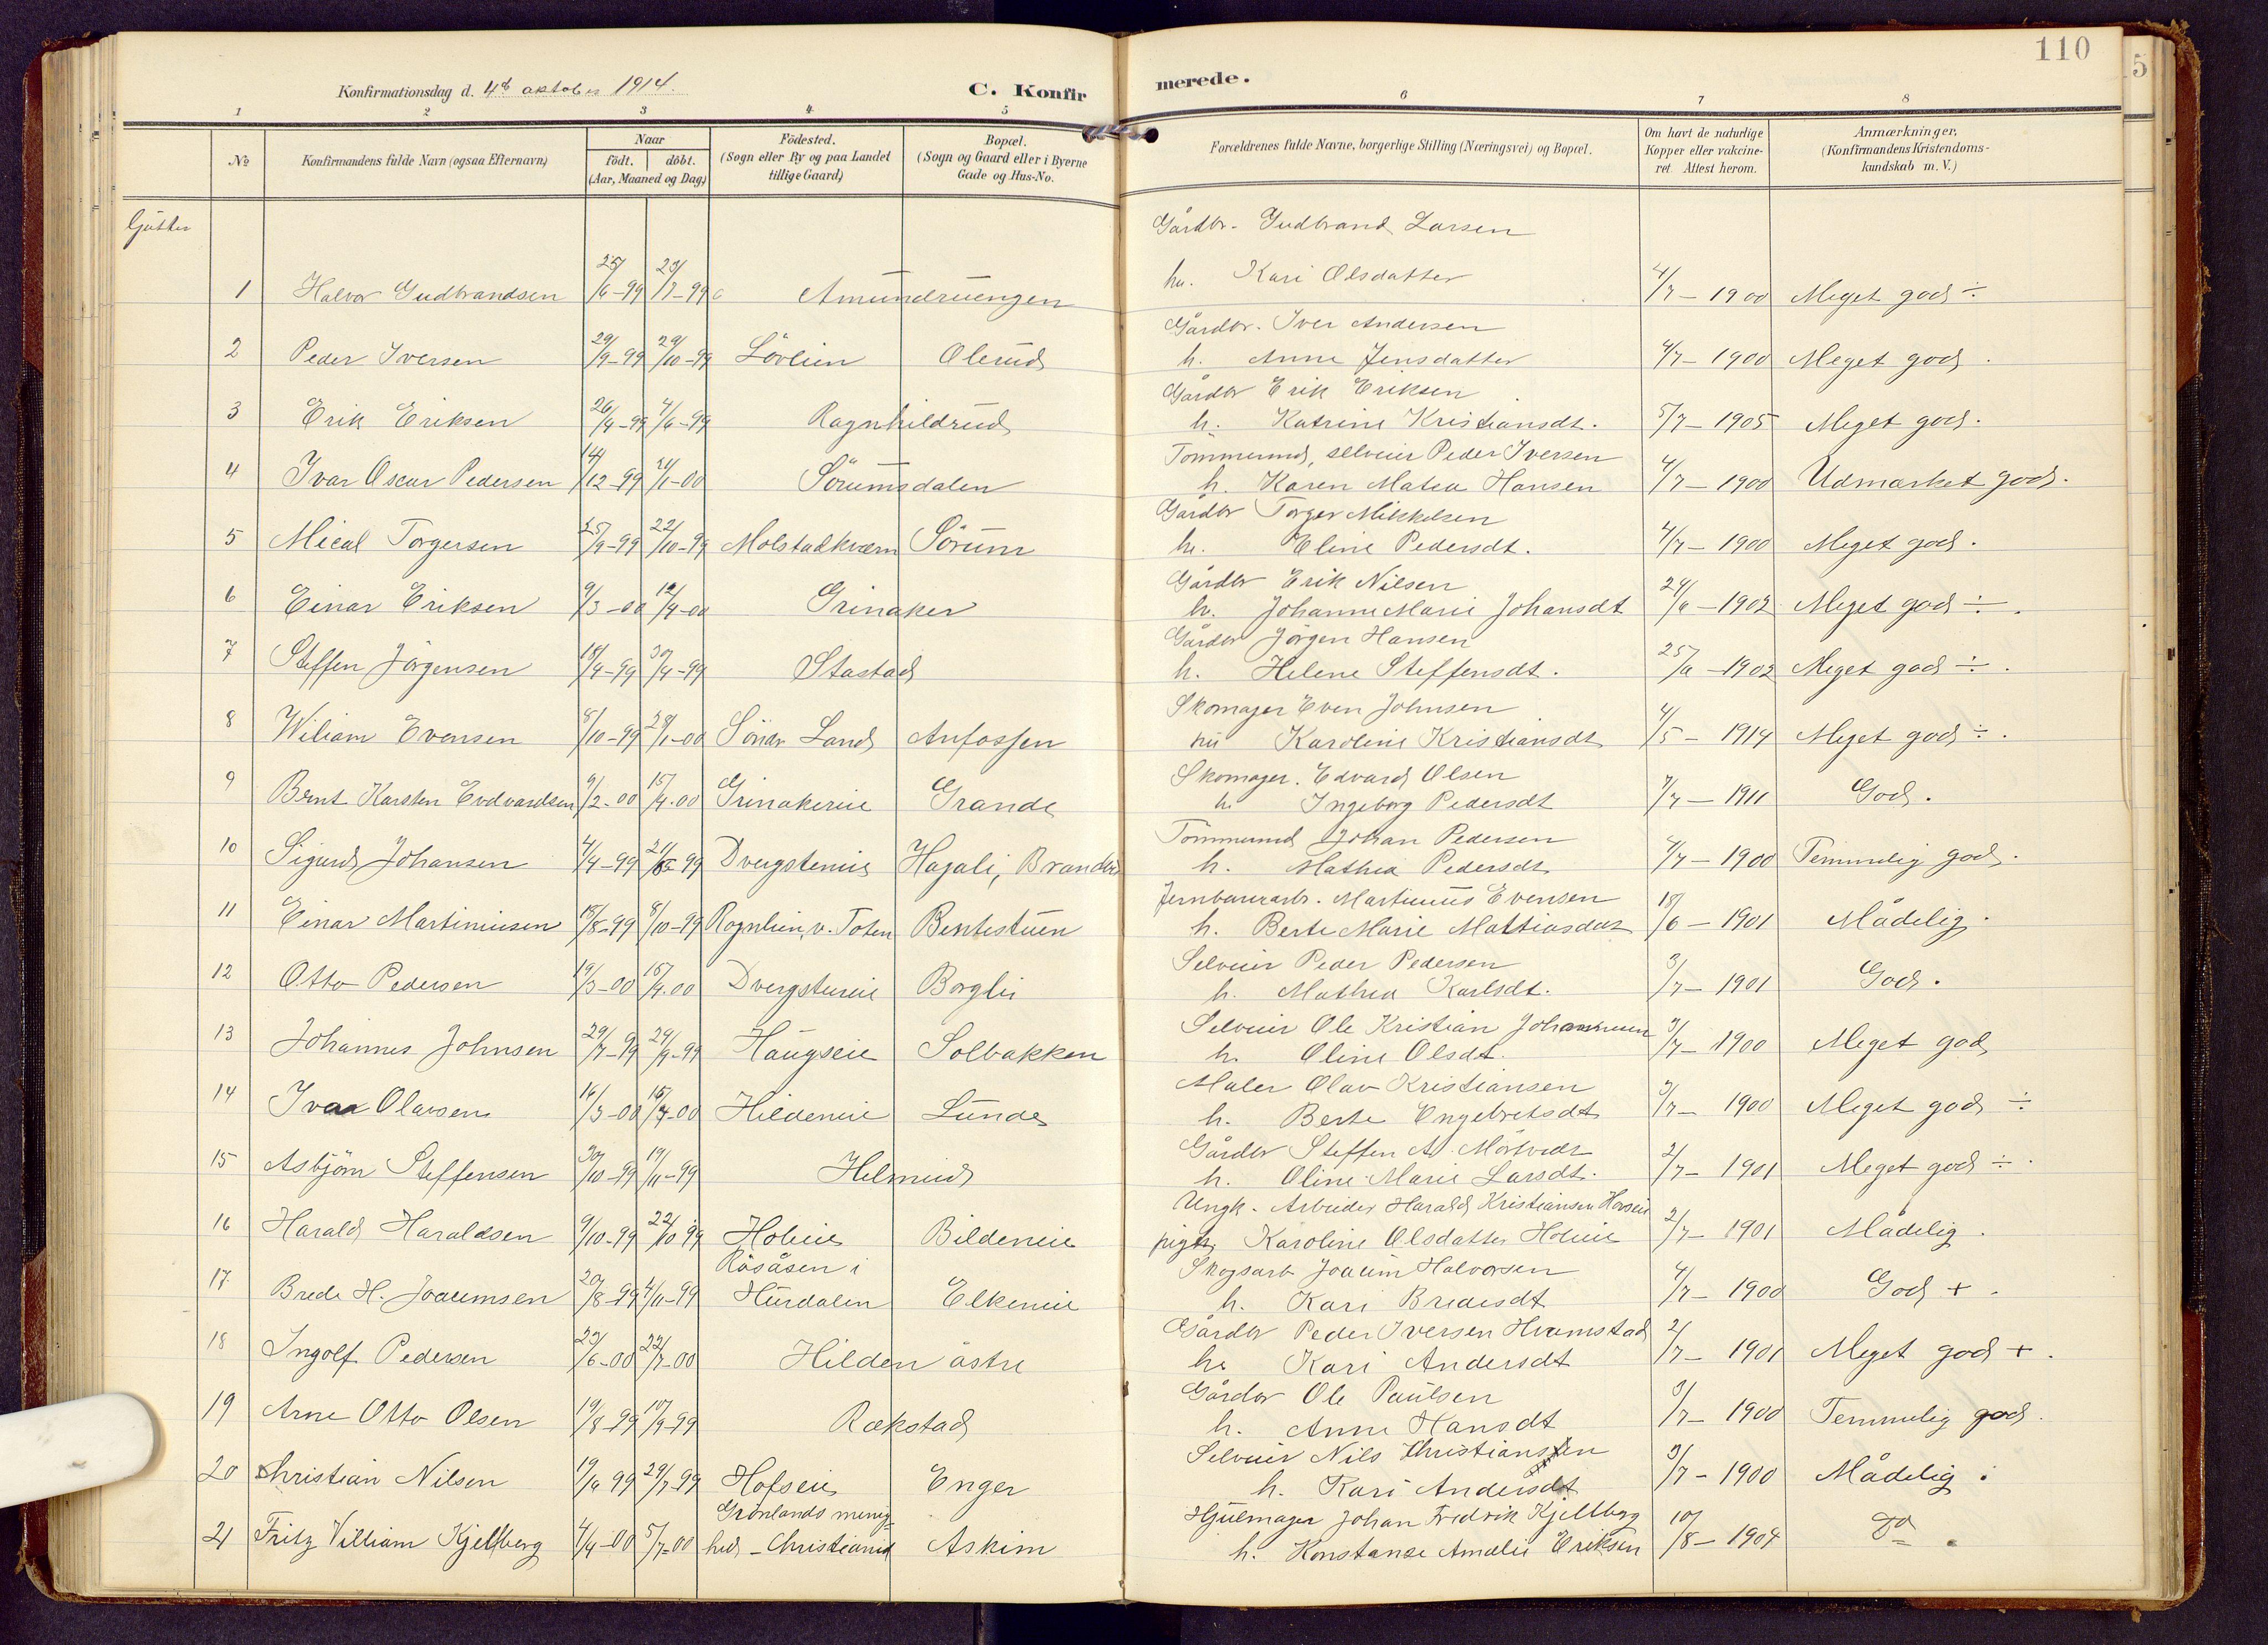 SAH, Brandbu prestekontor, Klokkerbok nr. 9, 1903-1916, s. 110